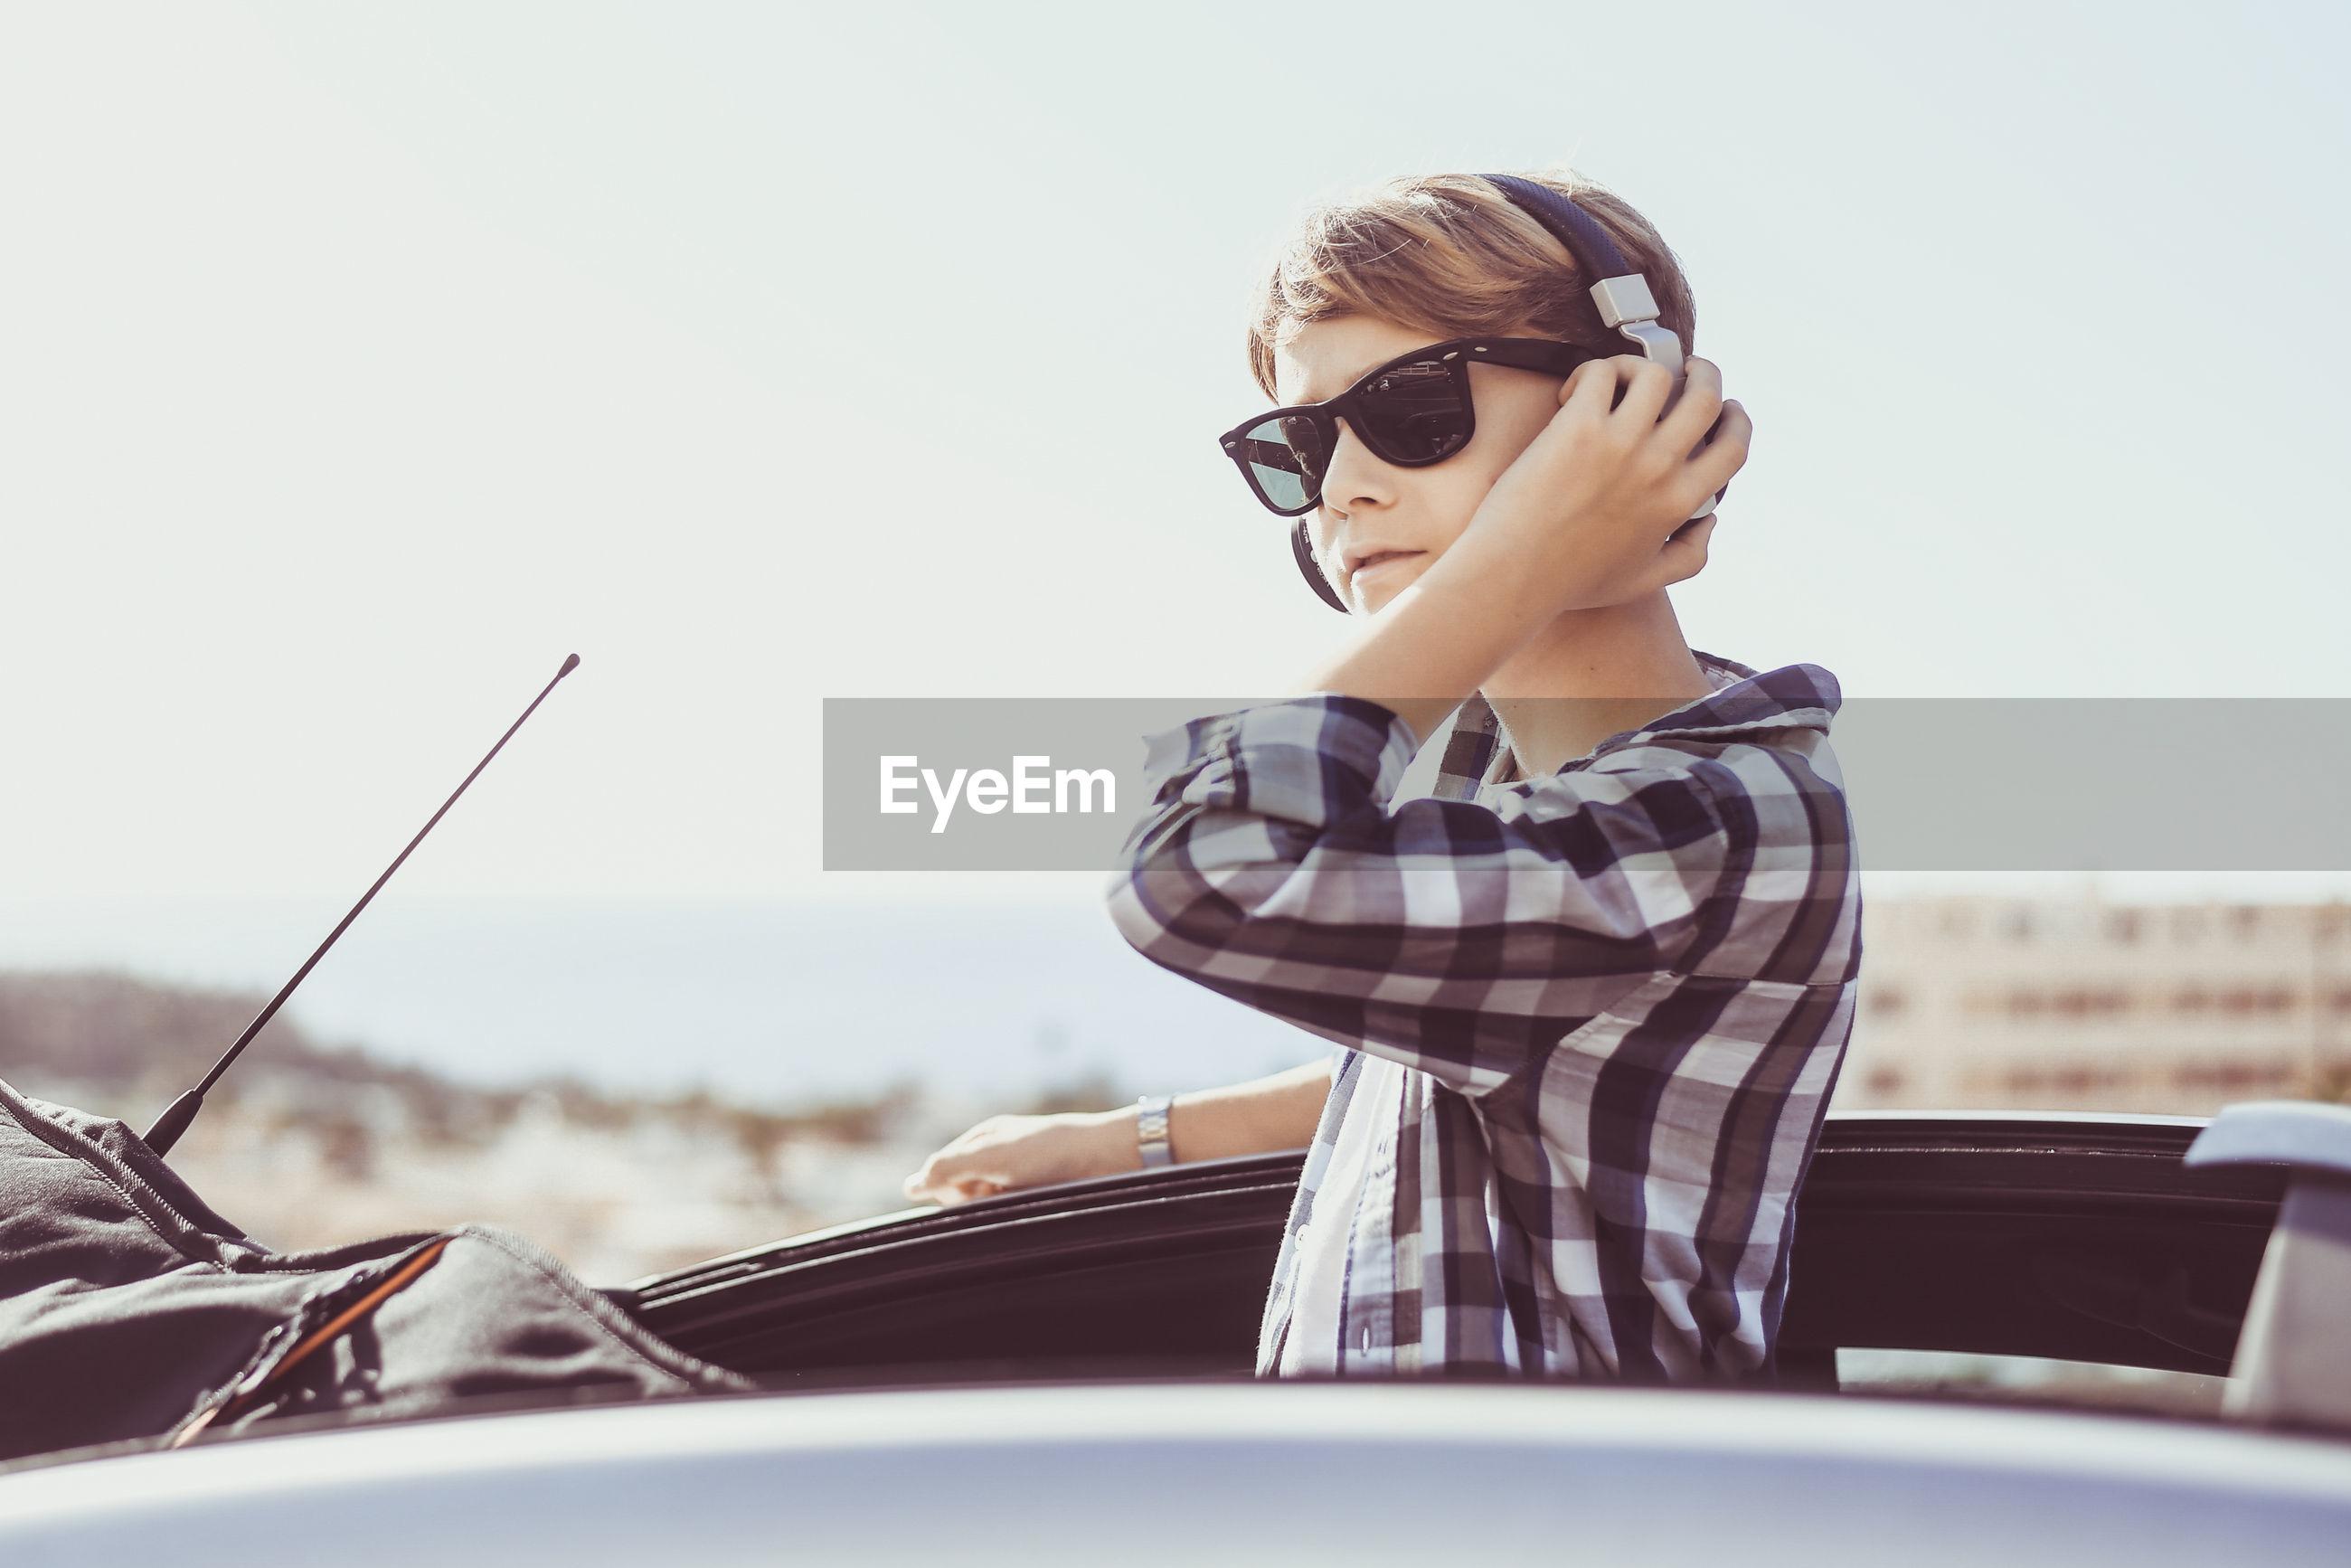 Boy wearing sunglasses against sky